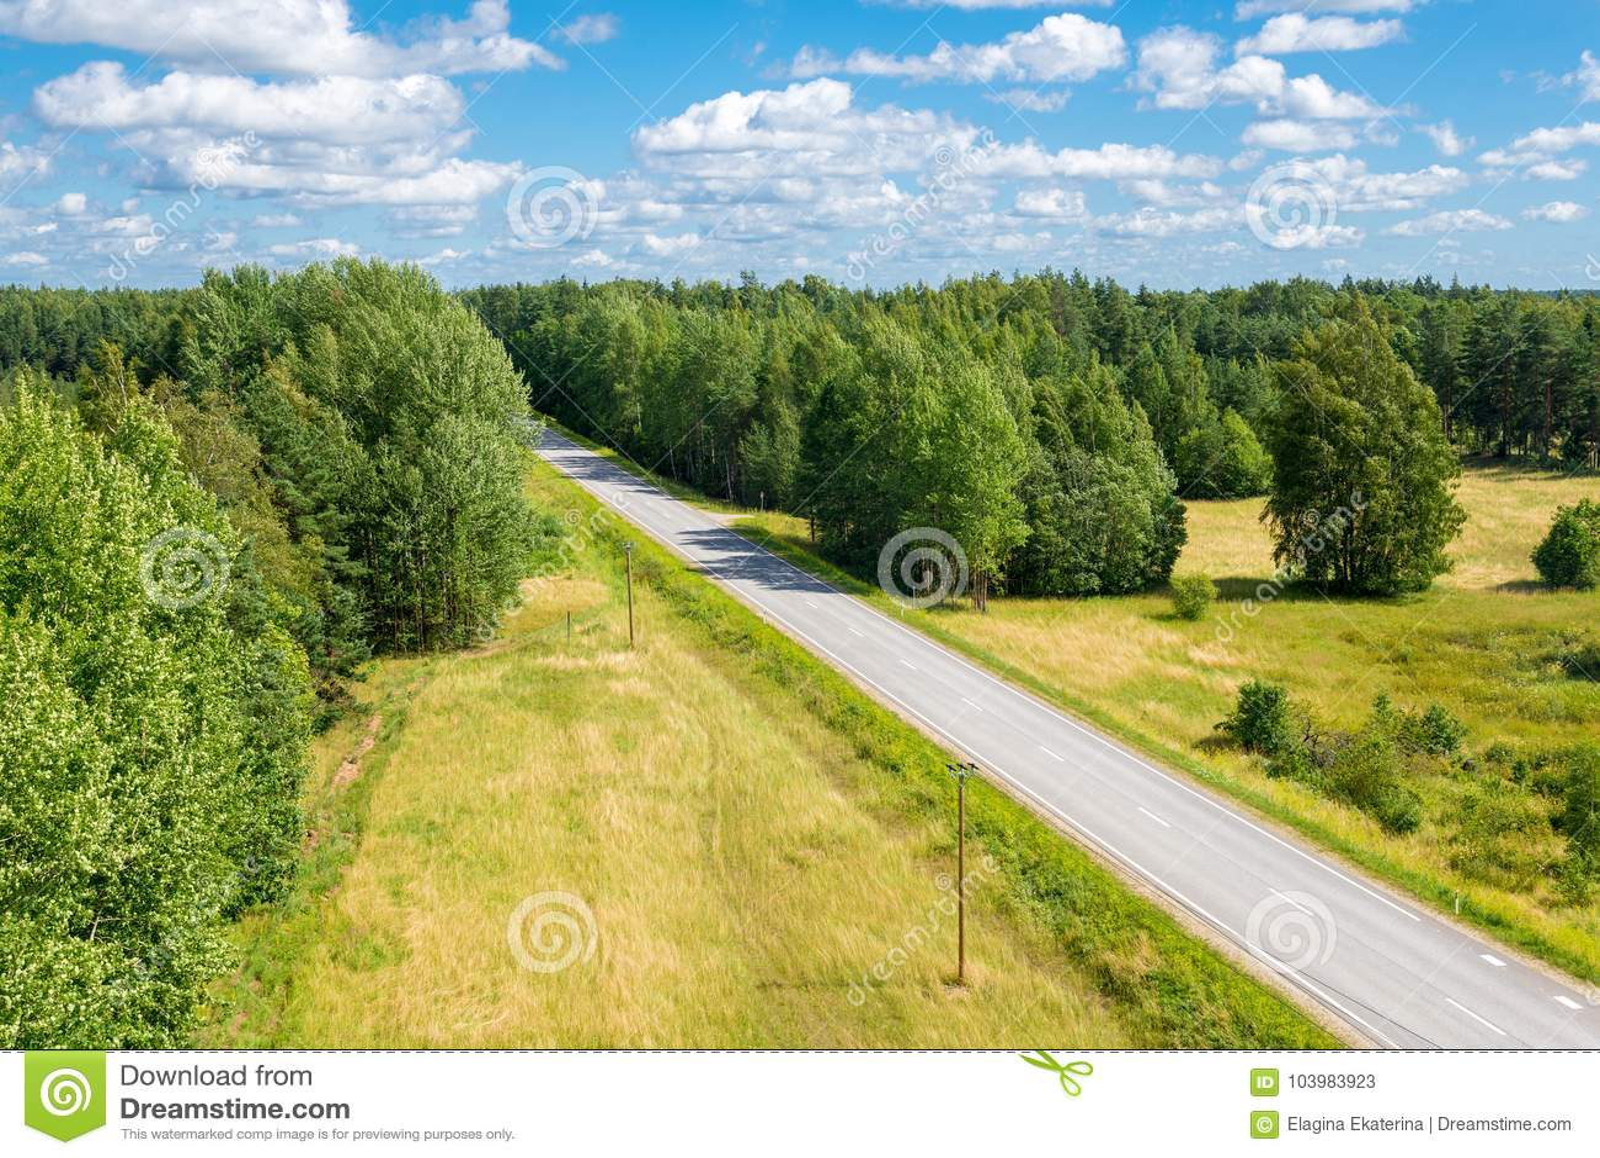 Ландшафт лета с дорогой среди взгляд сверху леса